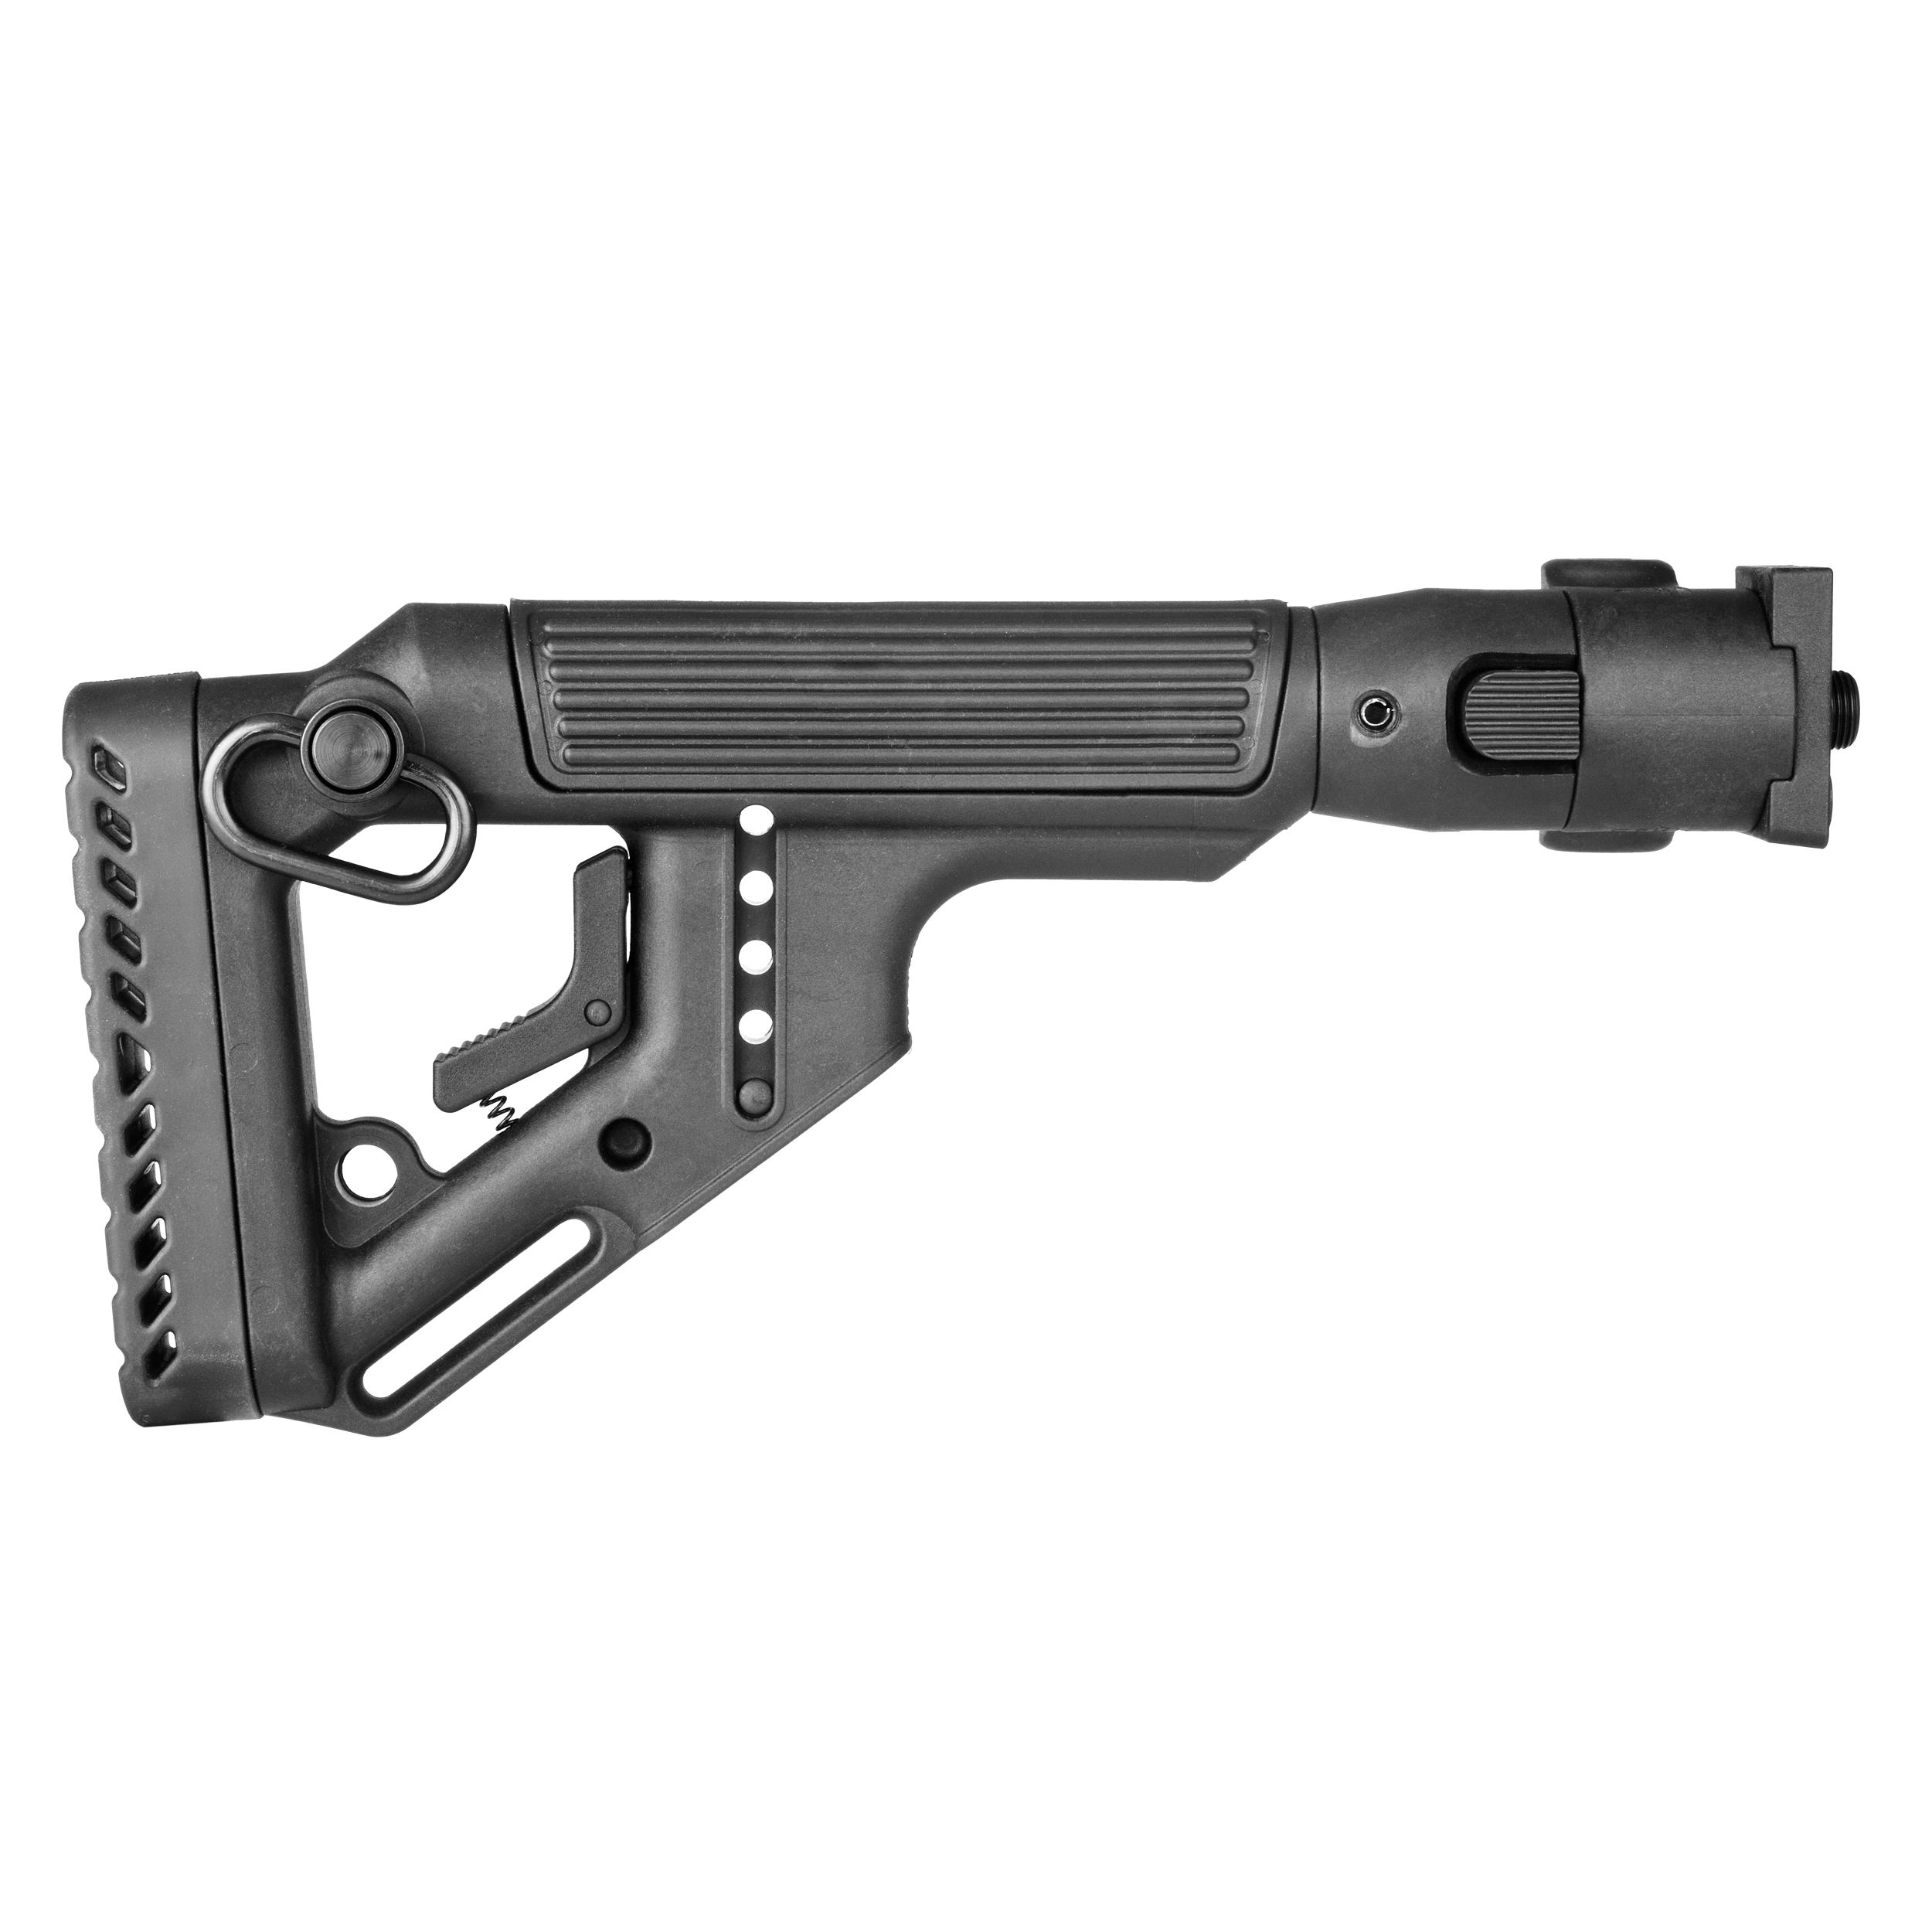 VZ58 folding stock / cheek rest(Polymer Joint)